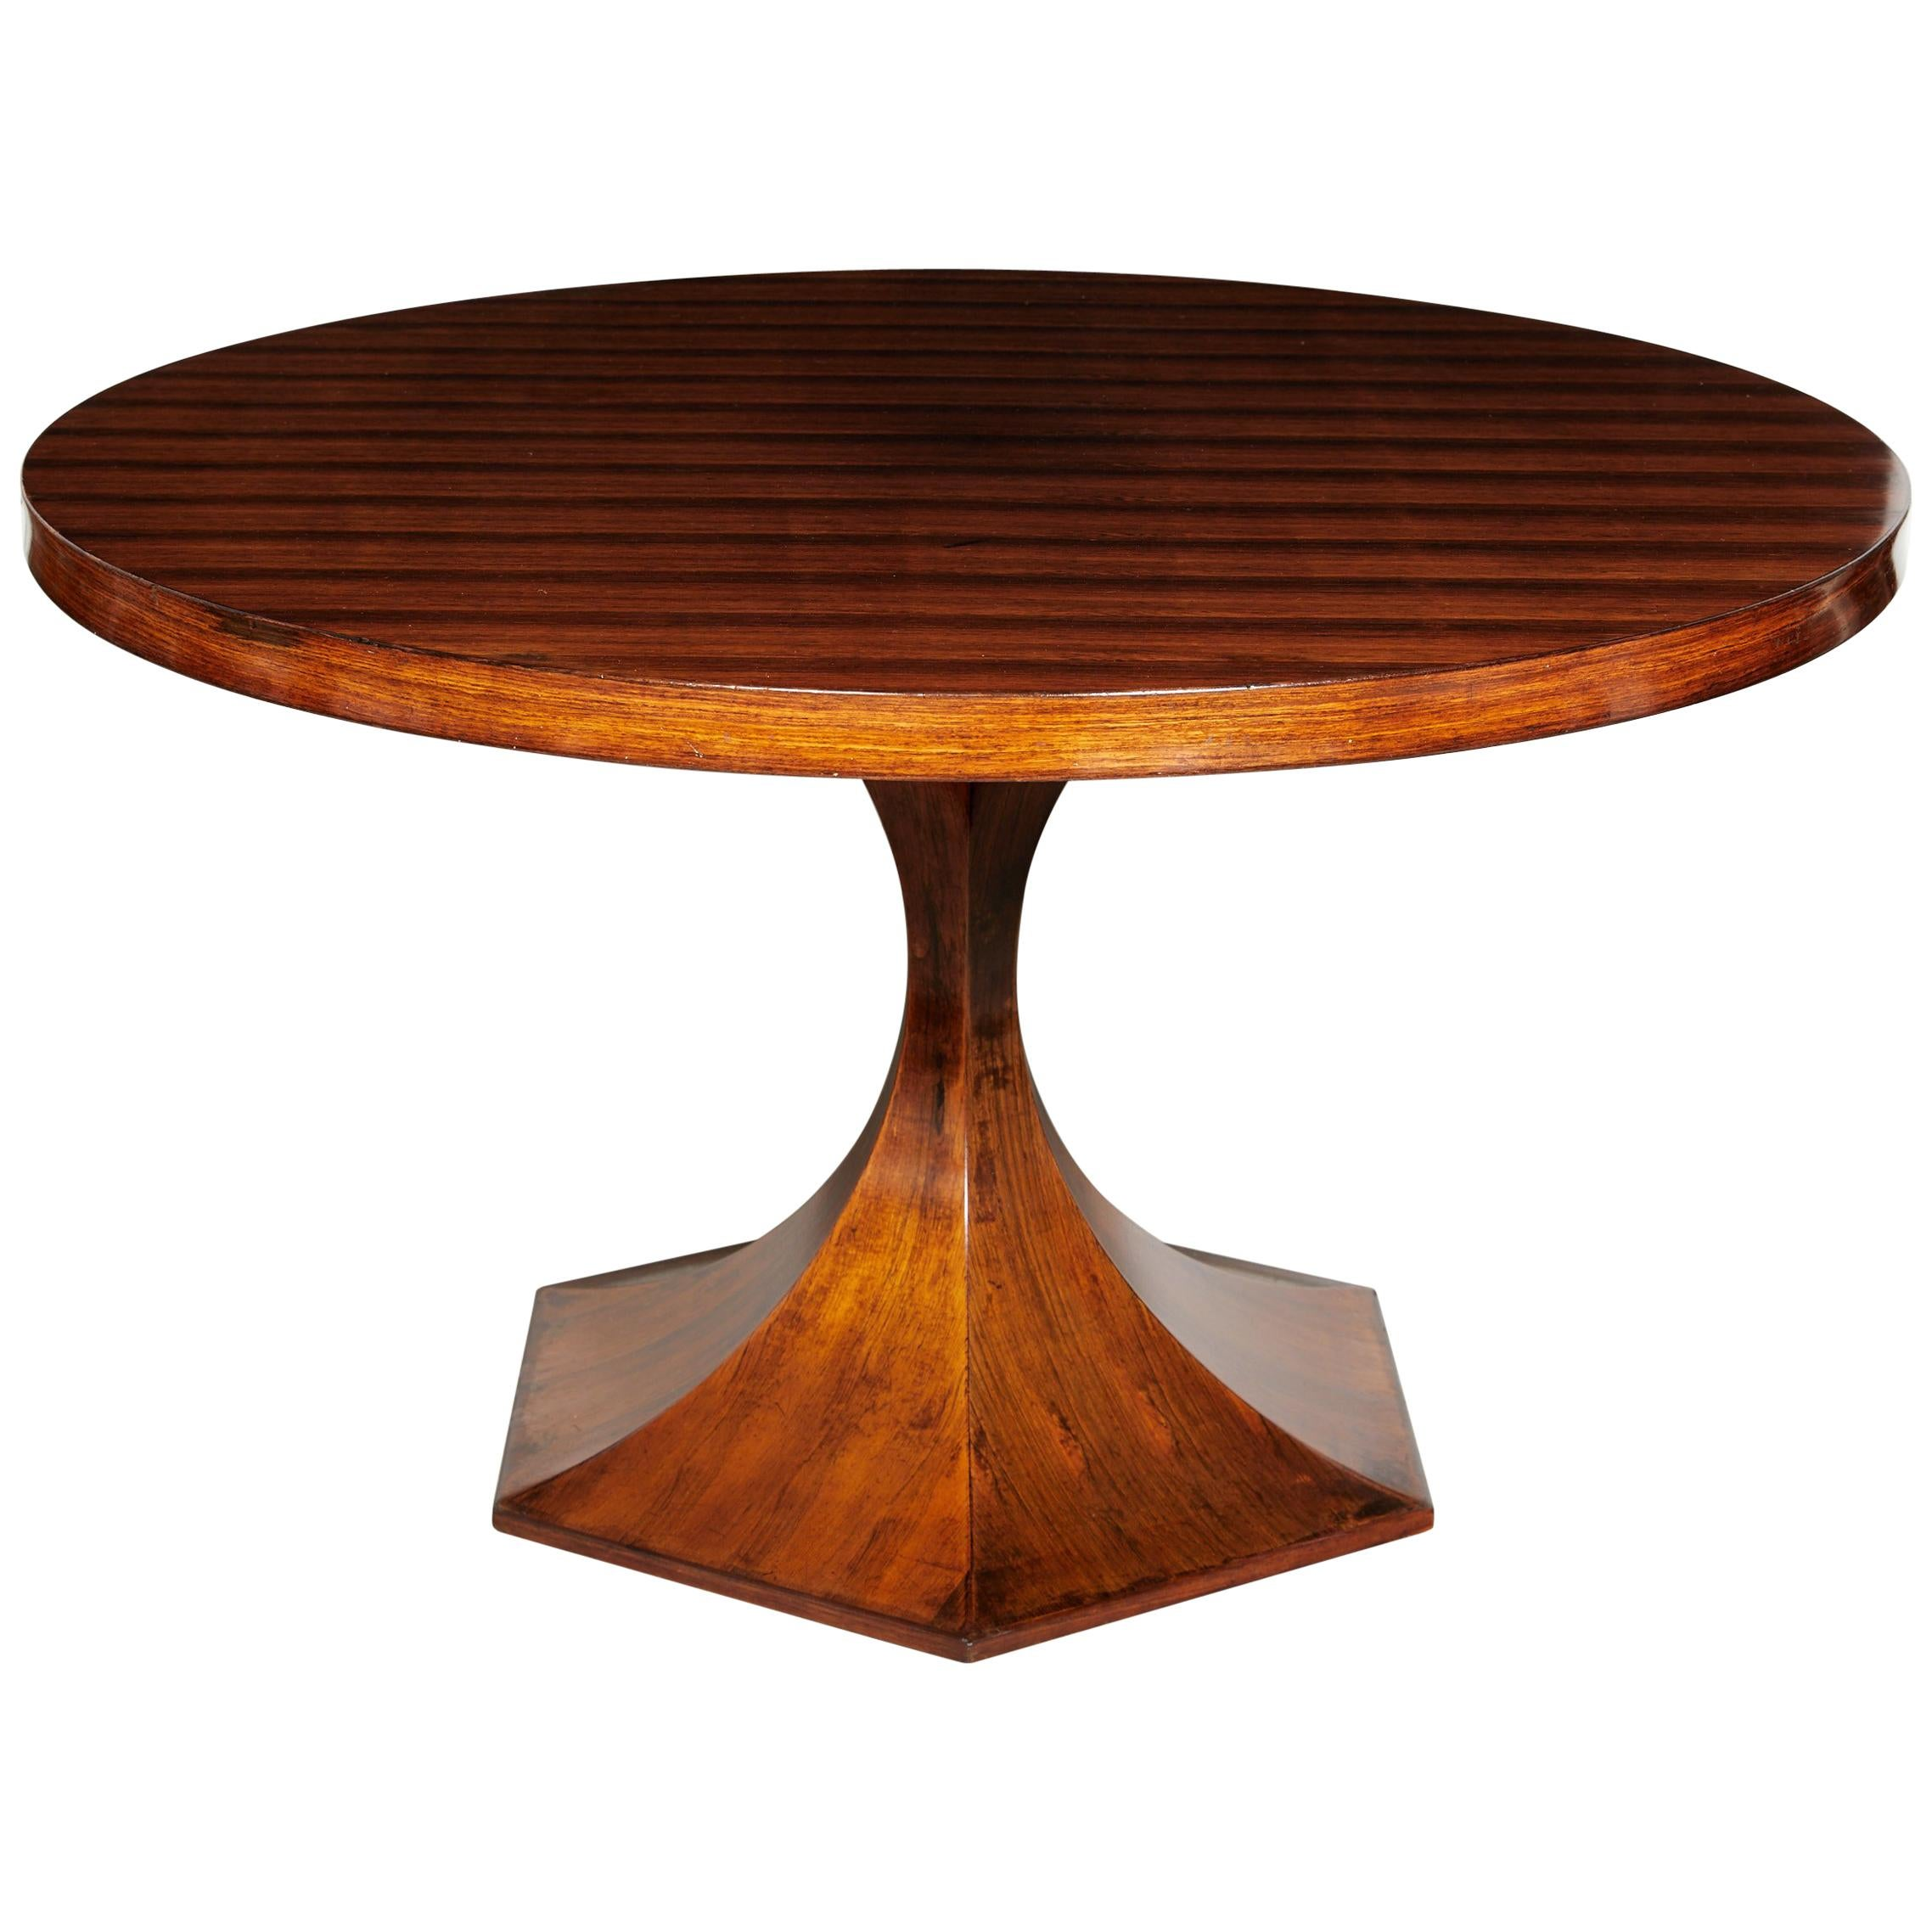 Italian Round Pedestal Dining Table Of Palisander Wood